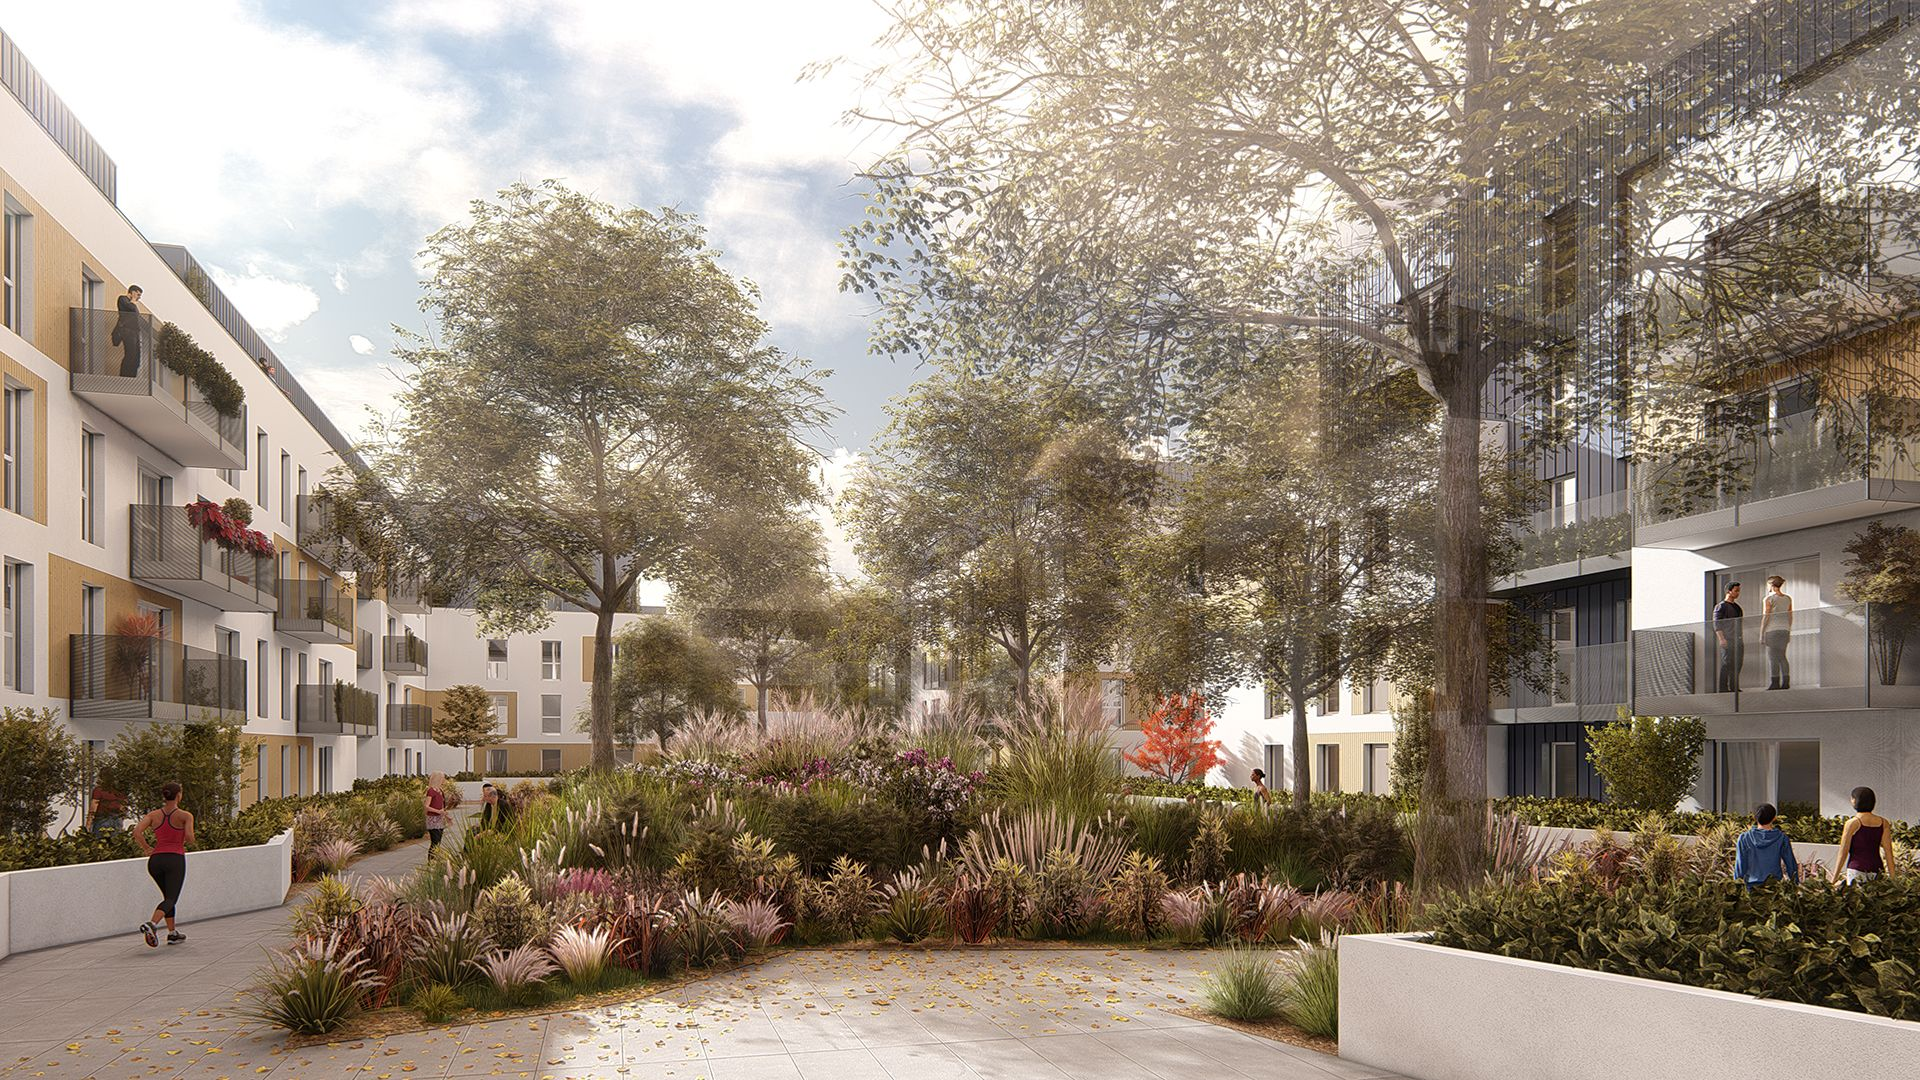 Architecture and #garden #design, rendered in Lumion 8 5 by Eigol